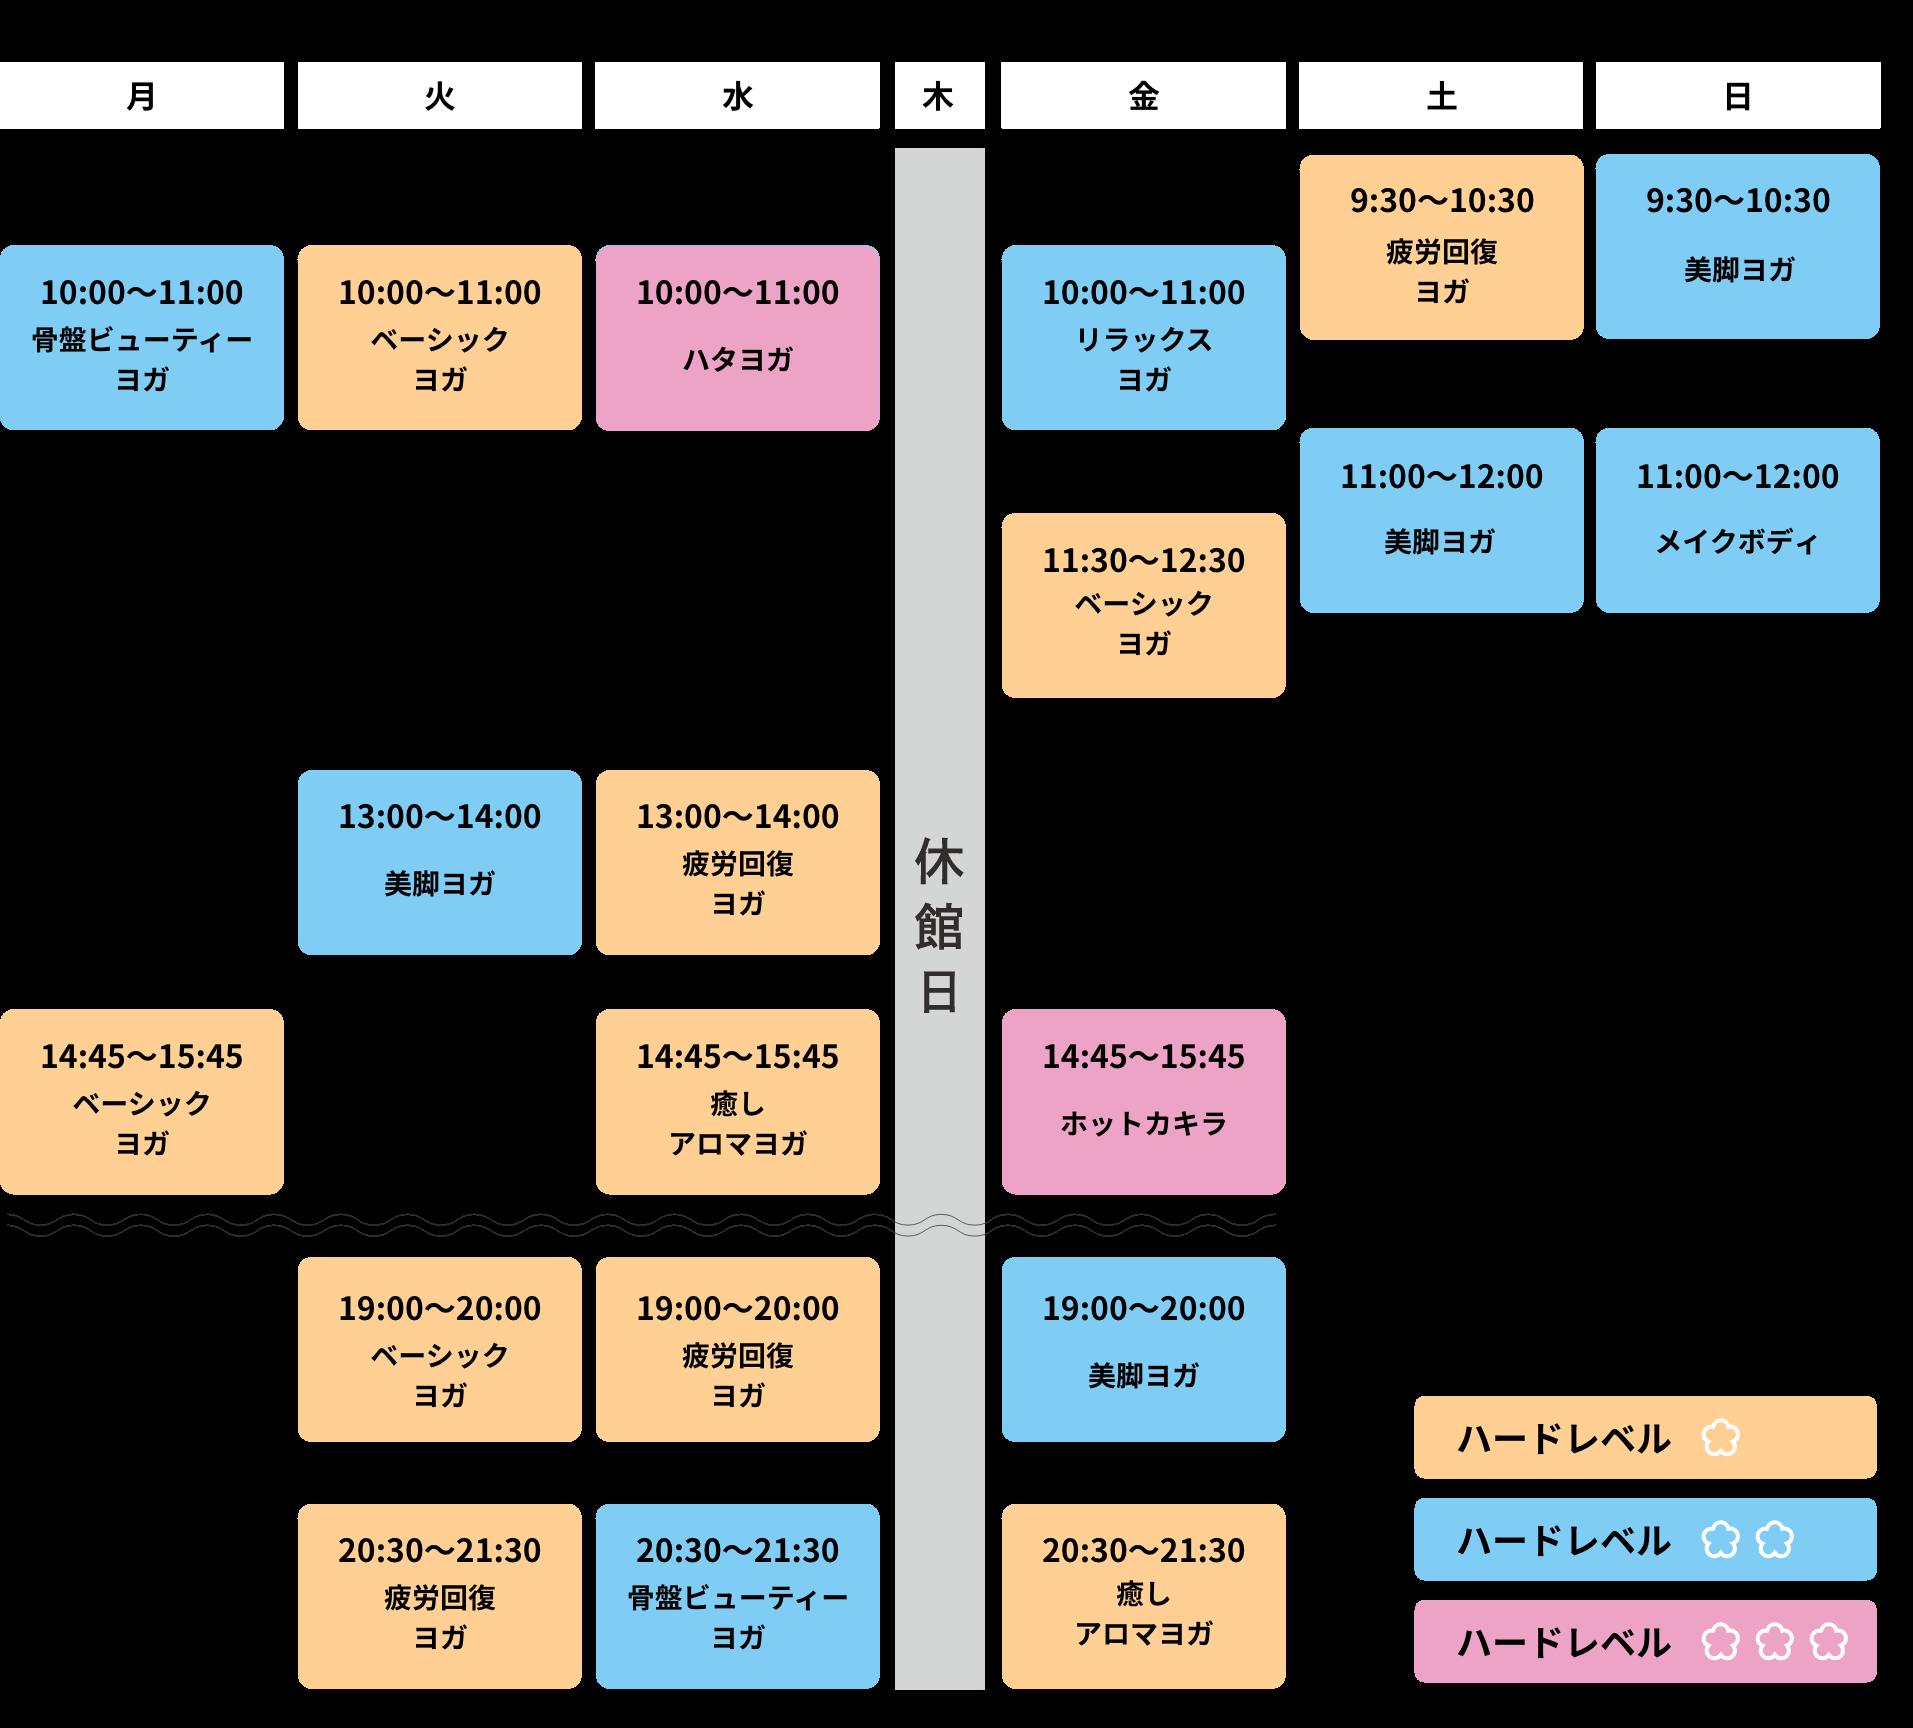 SCHEDULE 図説